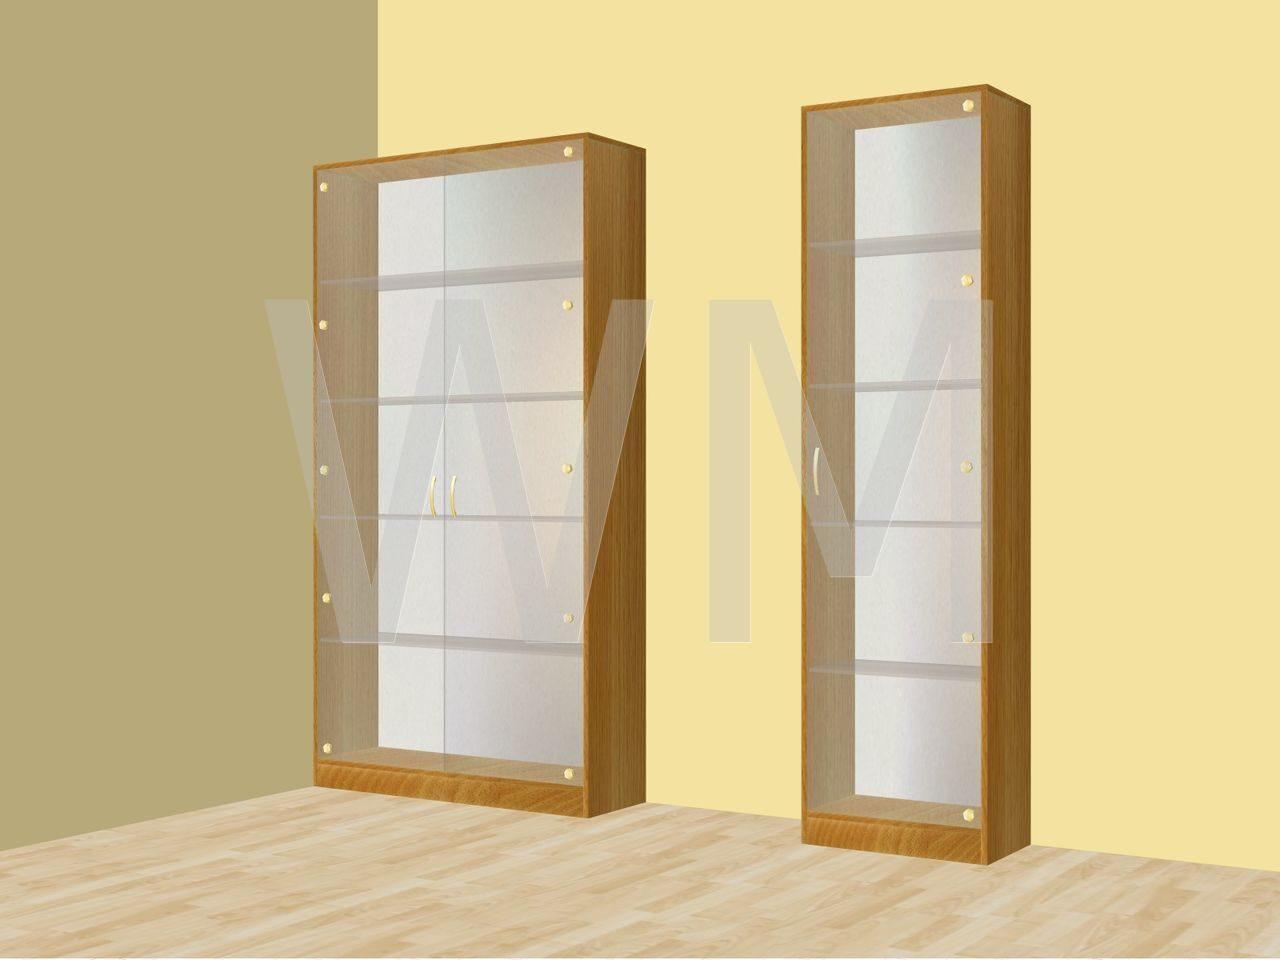 Шкафы для коллекционных фигурок.